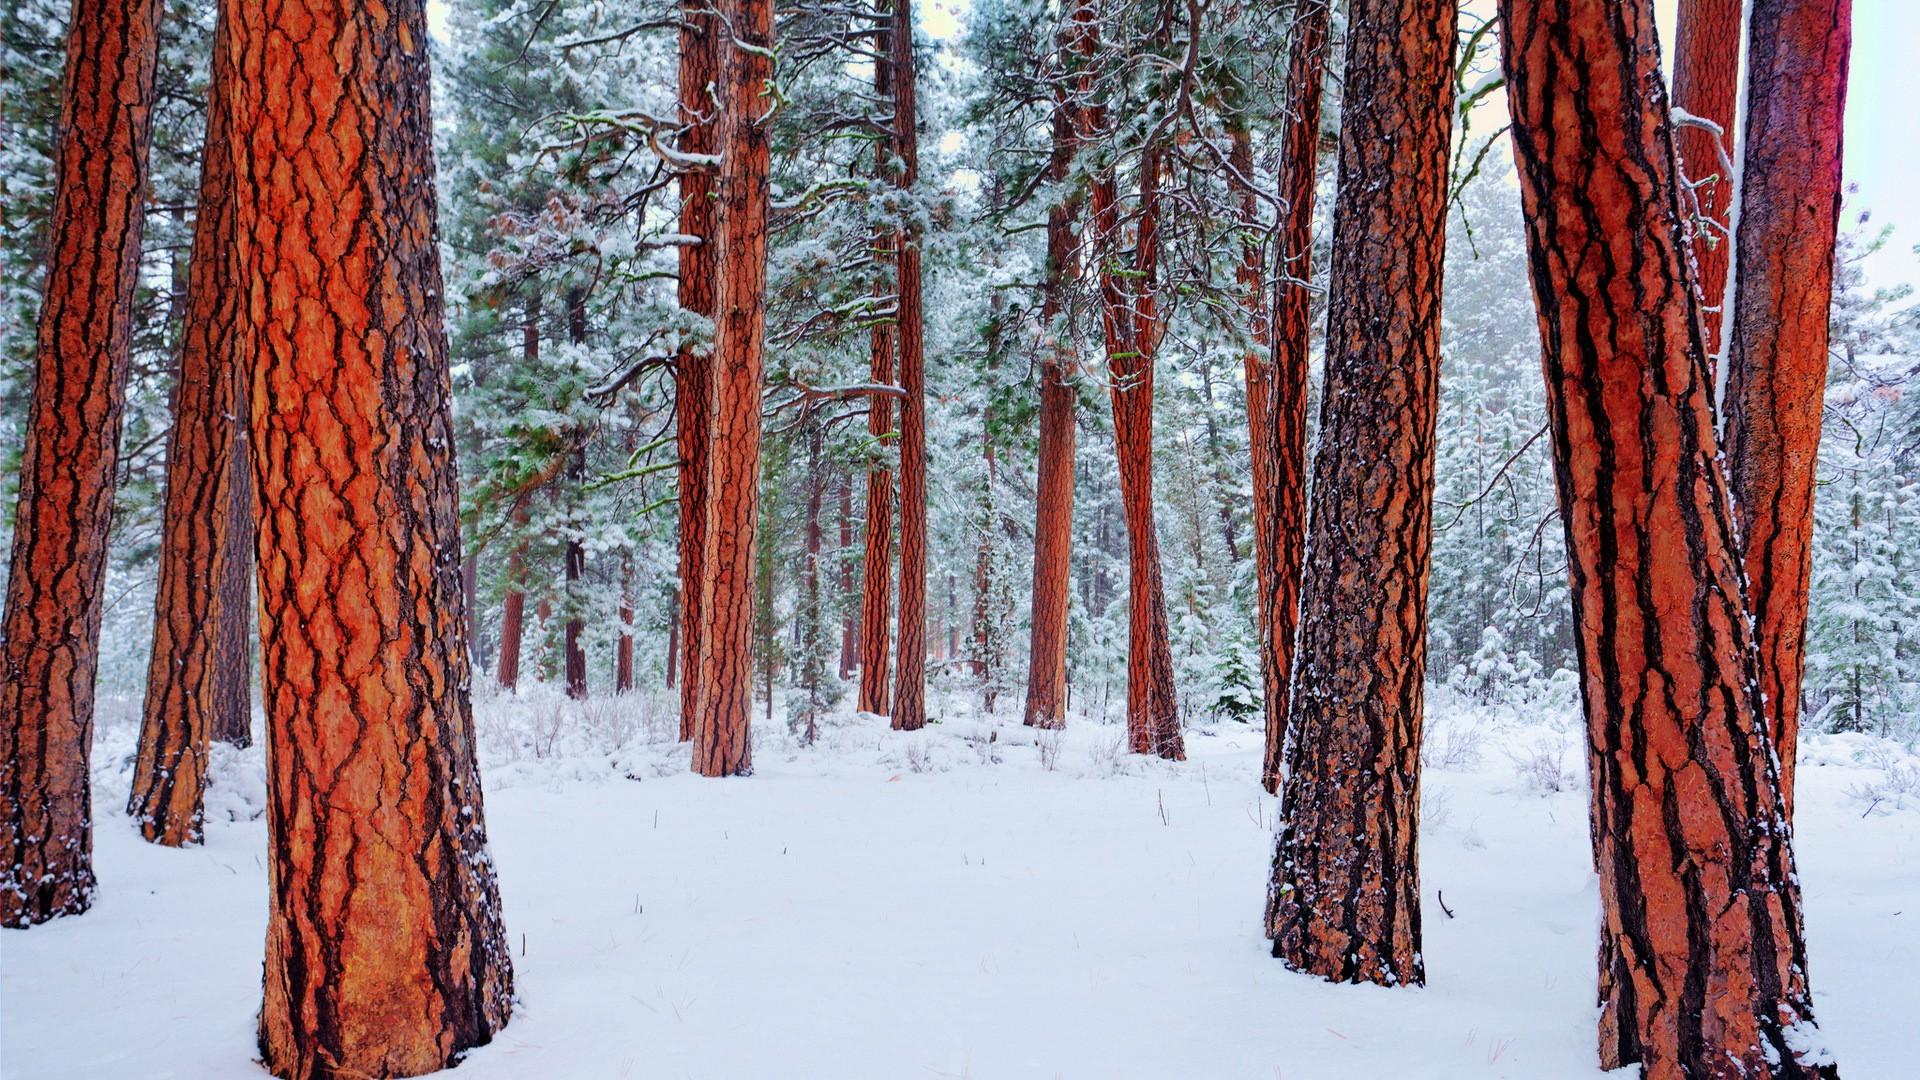 4k wallpaper nature redwoods - photo #26